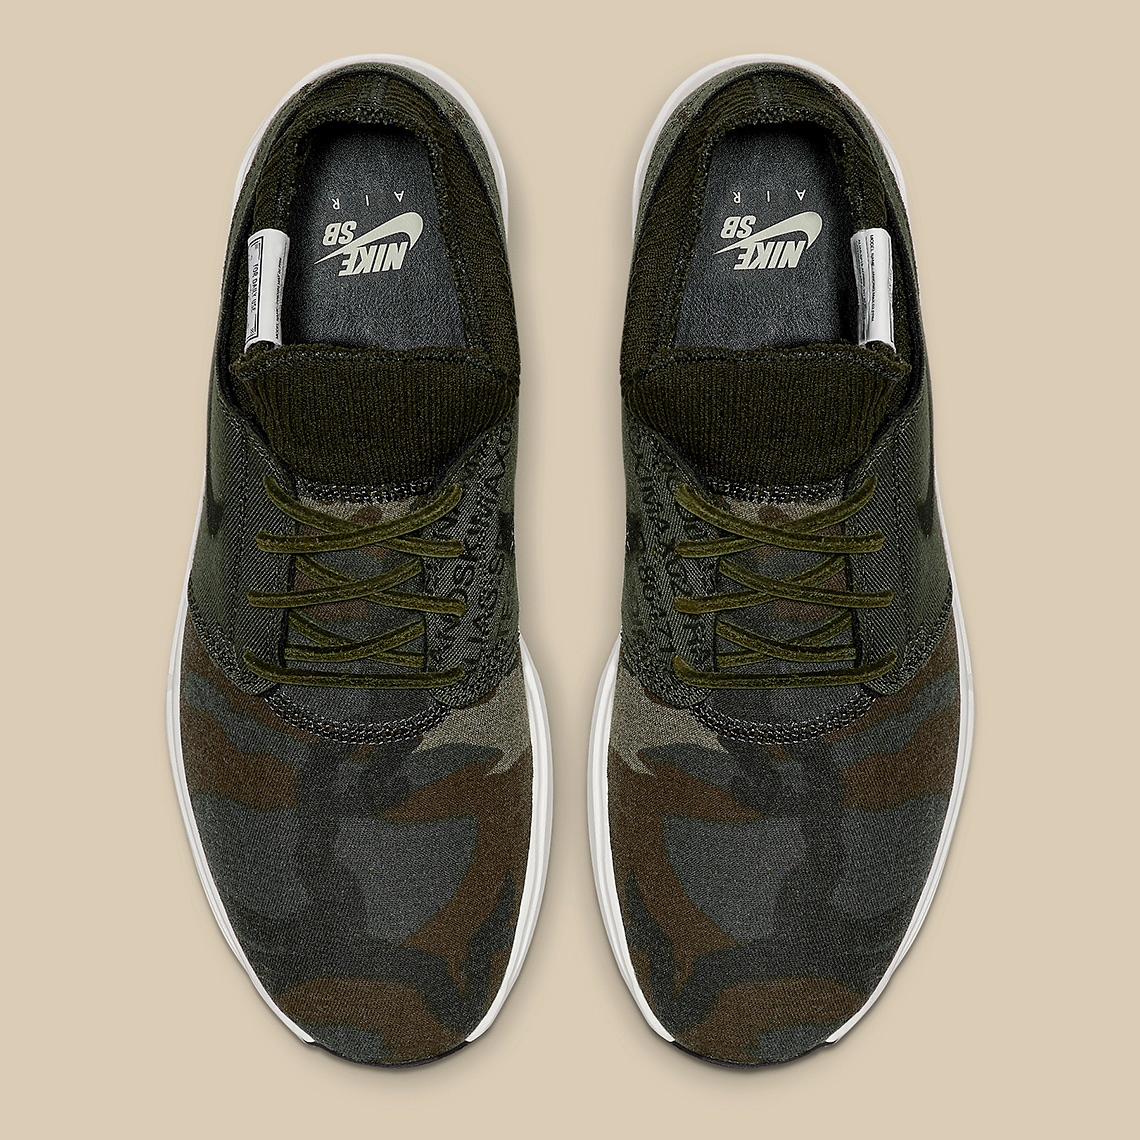 b970e6eaf45c Nike SB Janoski 2 Release Info